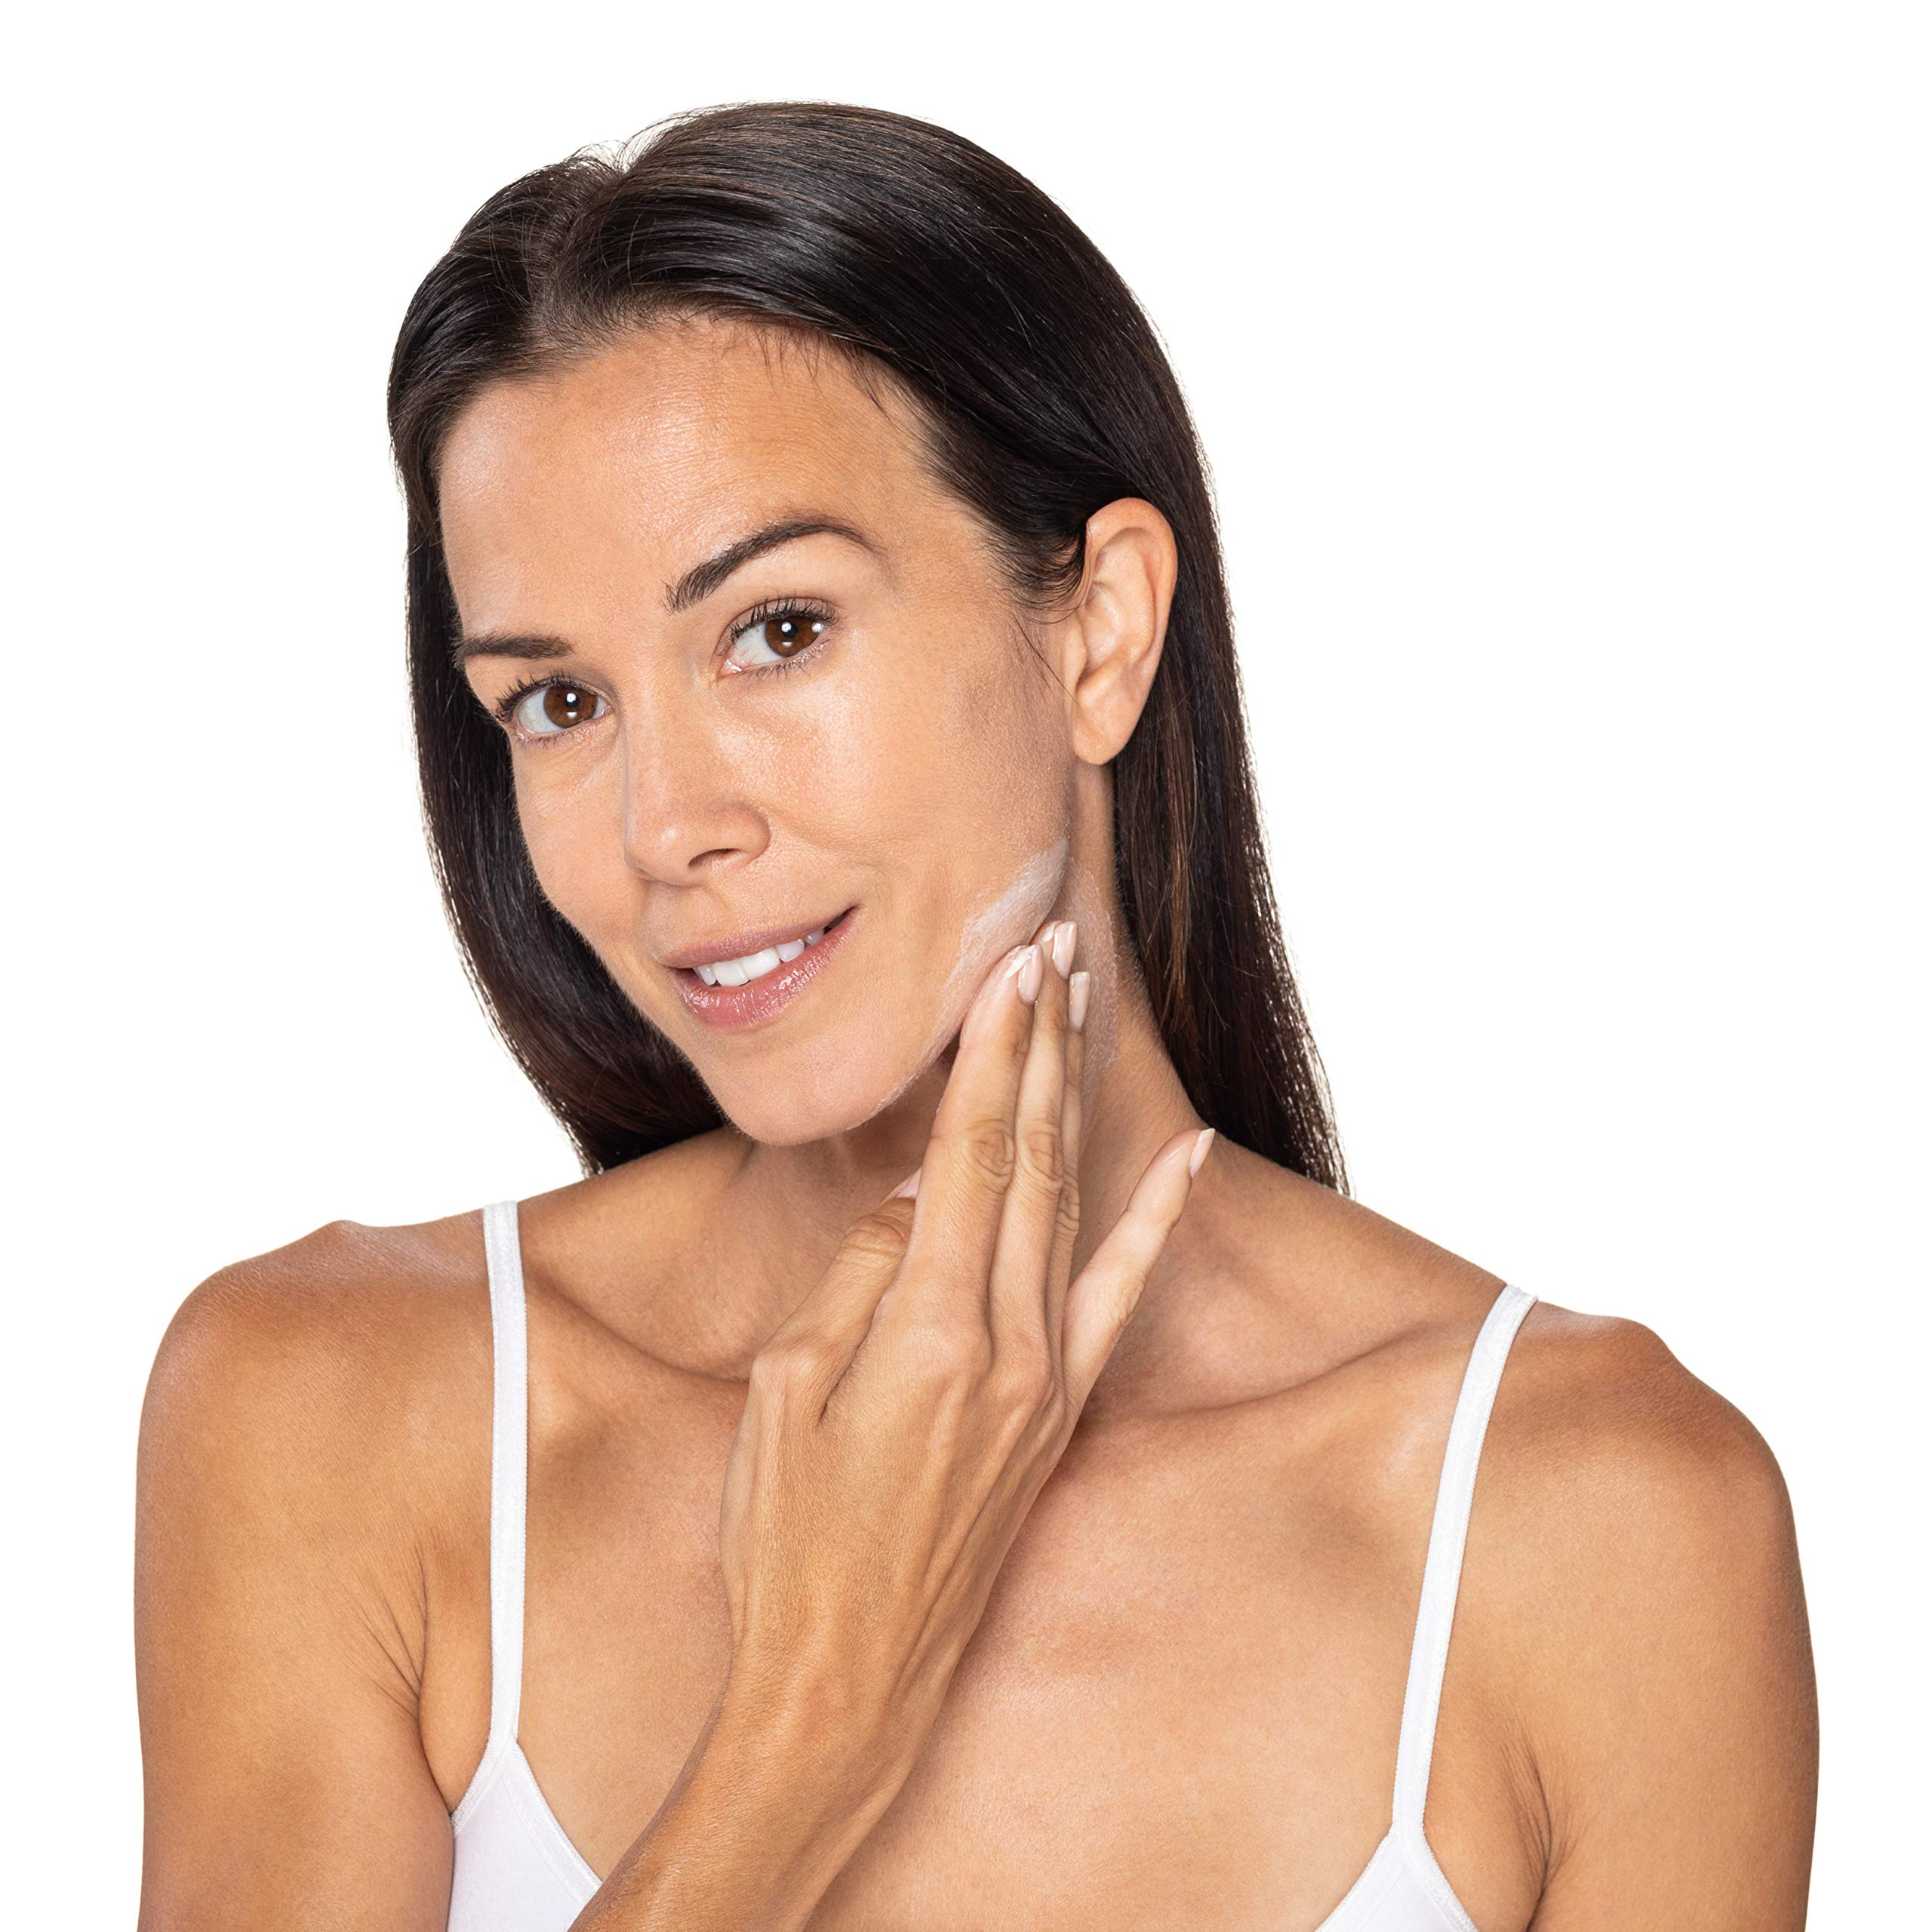 Neutrogena Triple Age Repair Anti-Aging Daily Facial Moisturizer with SPF 25 Sunscreen & Vitamin C